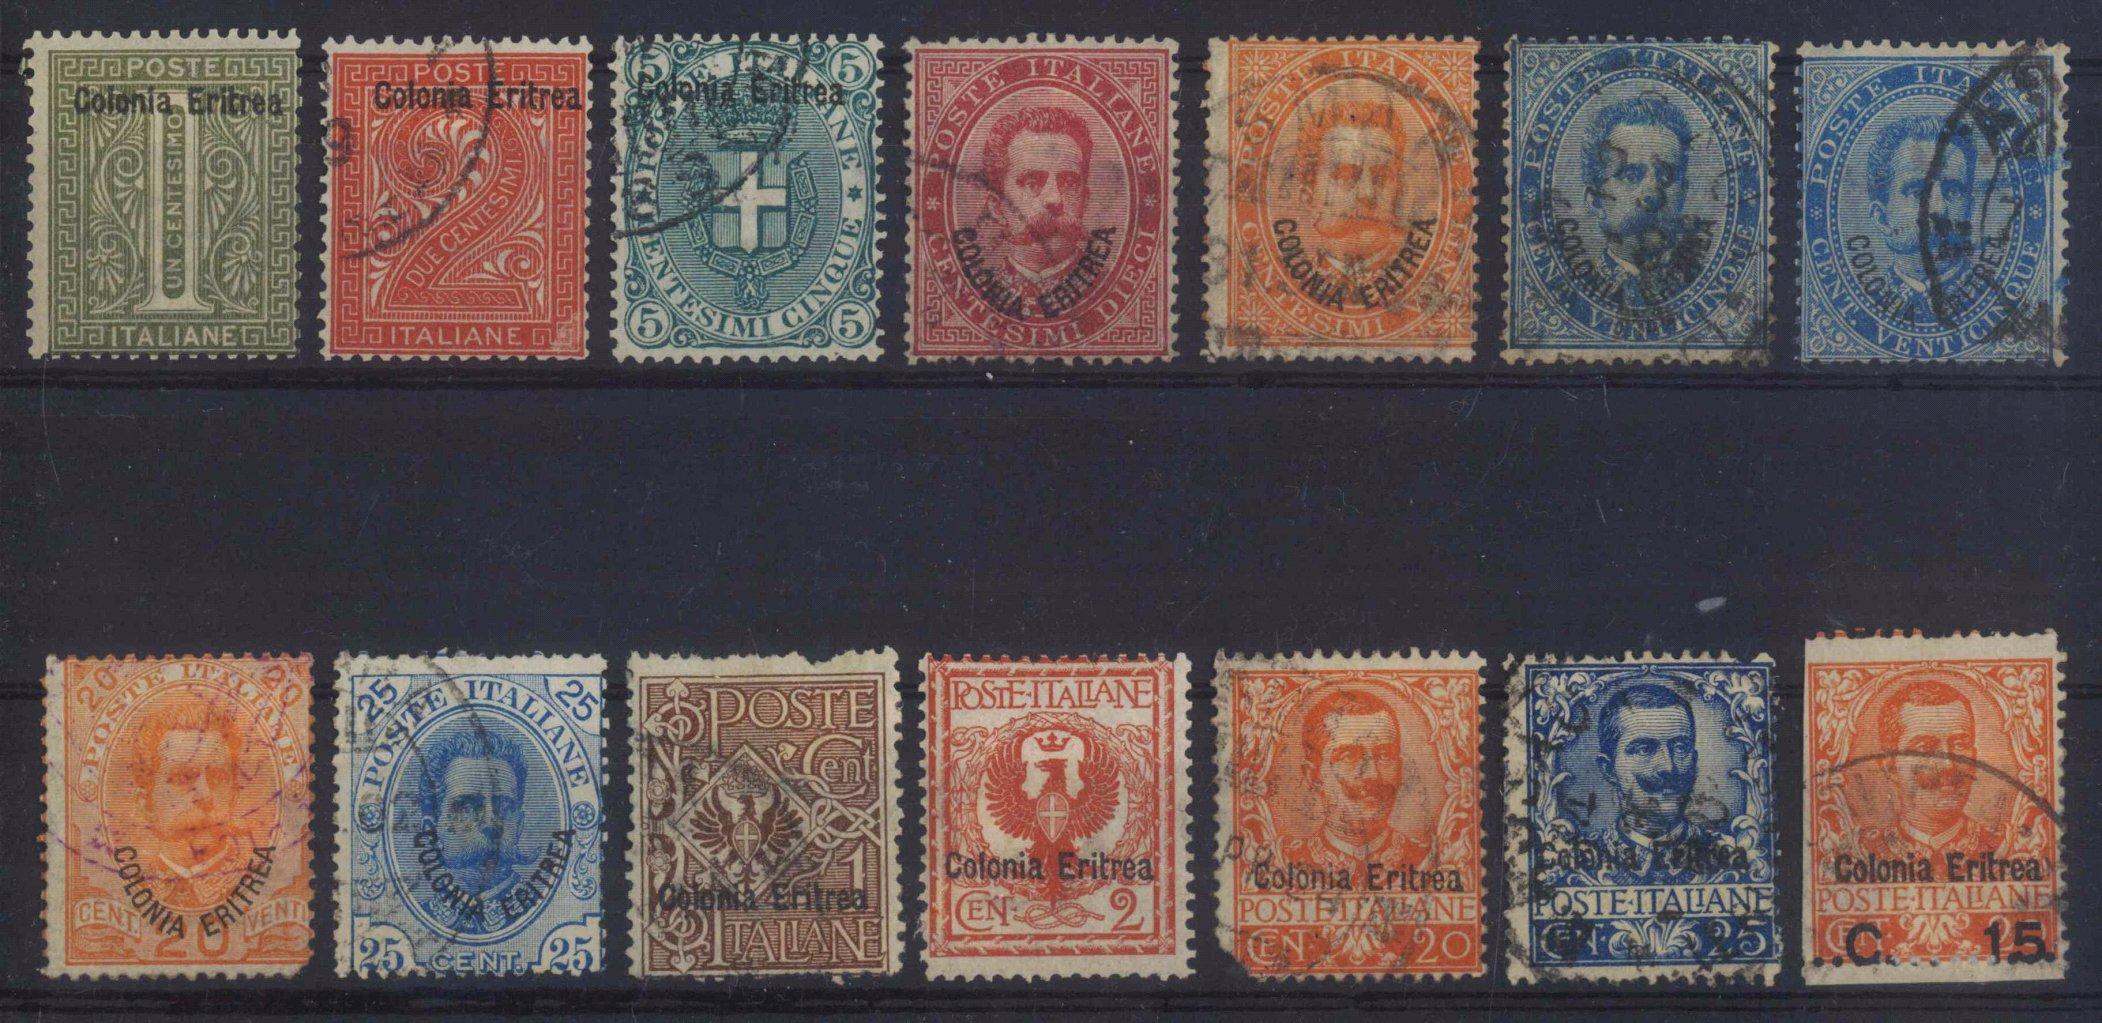 1893 ITALIENISCH-ERITREA